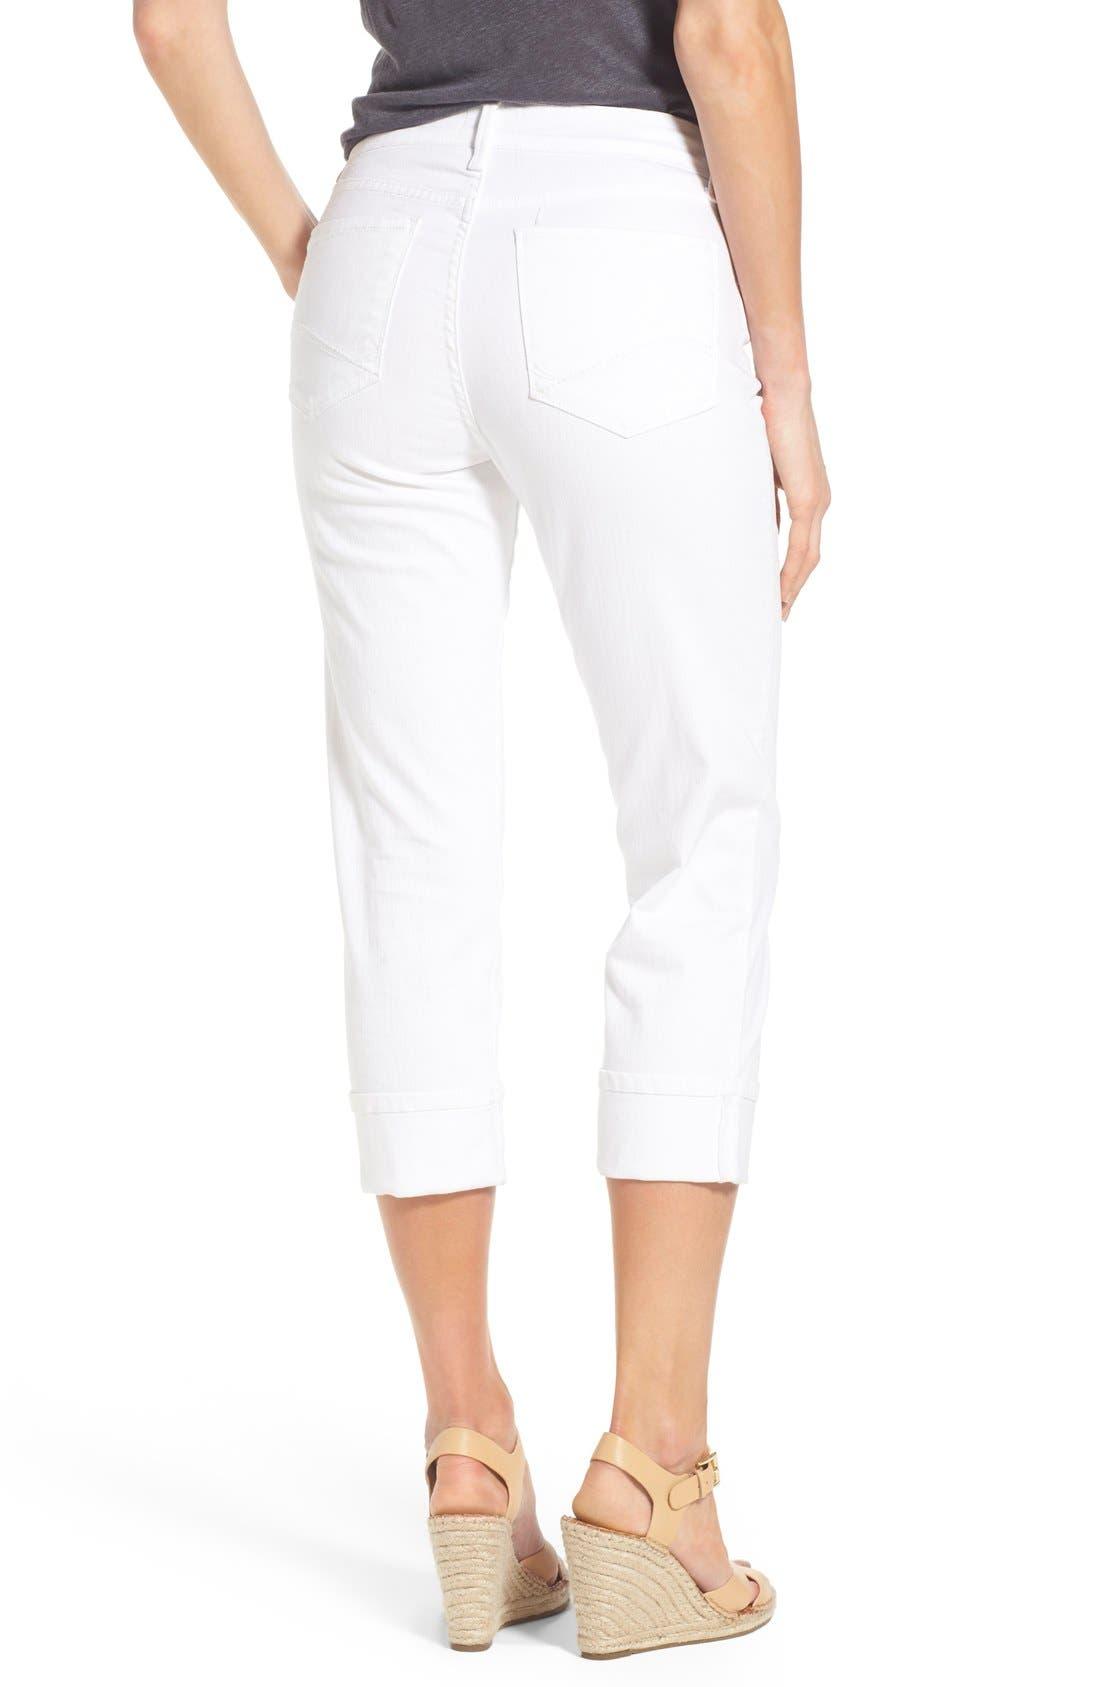 'Dayla' Colored Wide Cuff Capri Jeans,                             Alternate thumbnail 31, color,